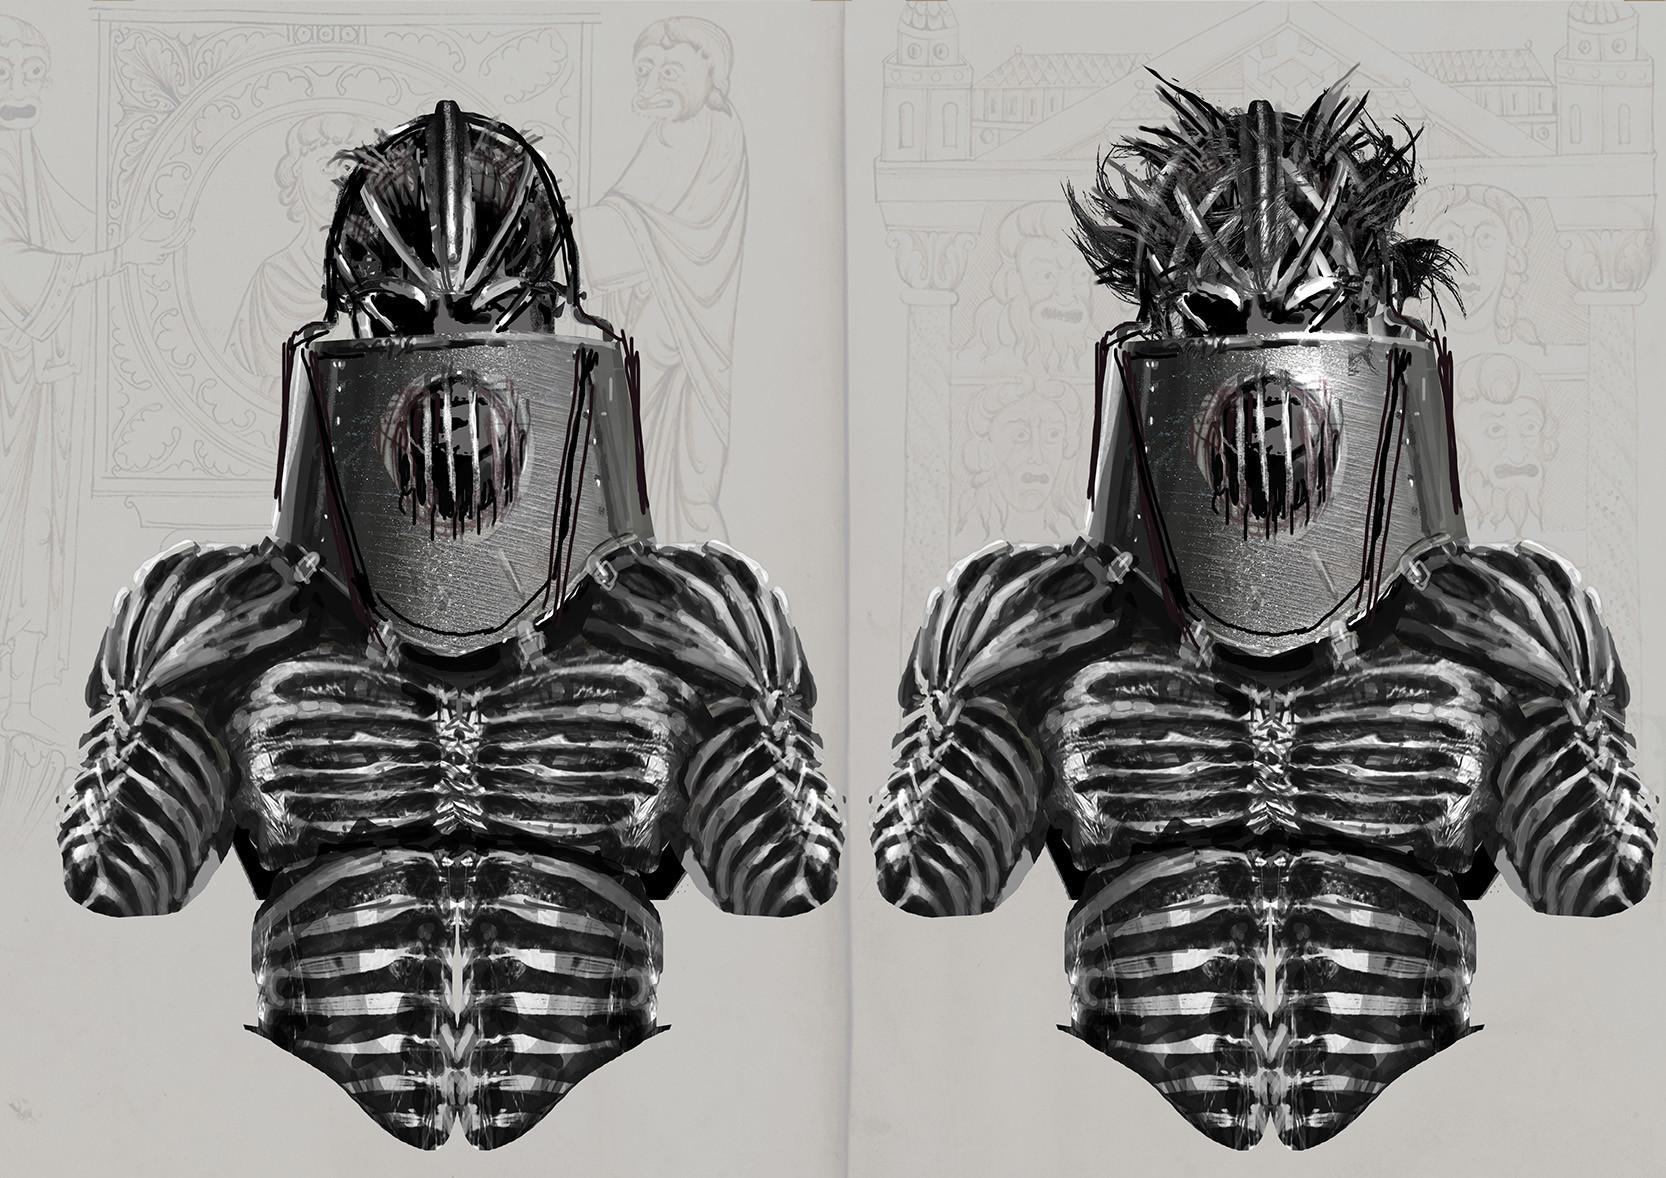 Andrei riabovitchev armor helmet v01